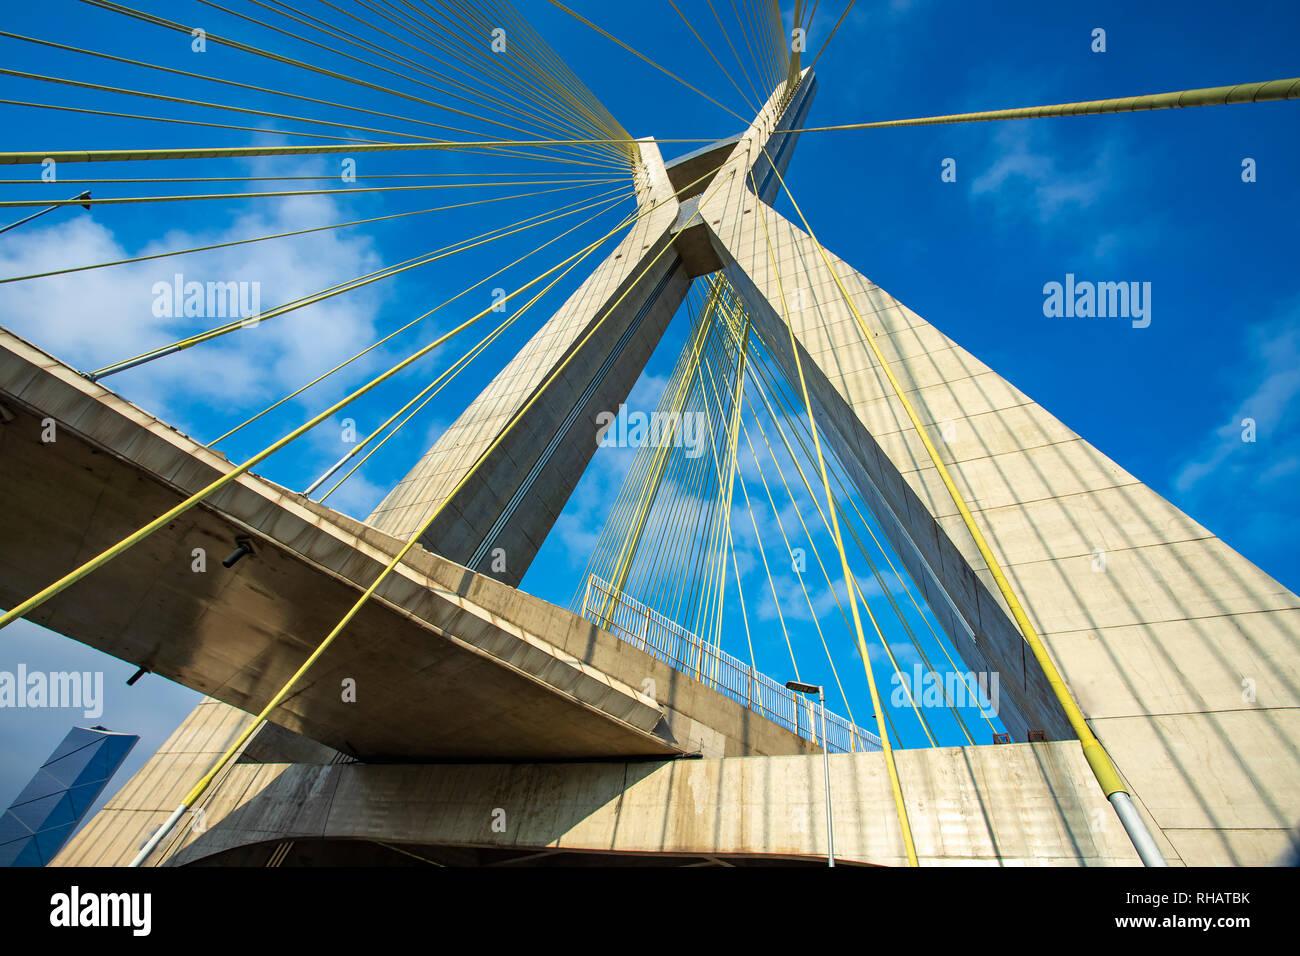 Modern architecture. Modern bridges. Cable-stayed bridge in the world, Sao Paulo Brazil, South America. Stock Photo